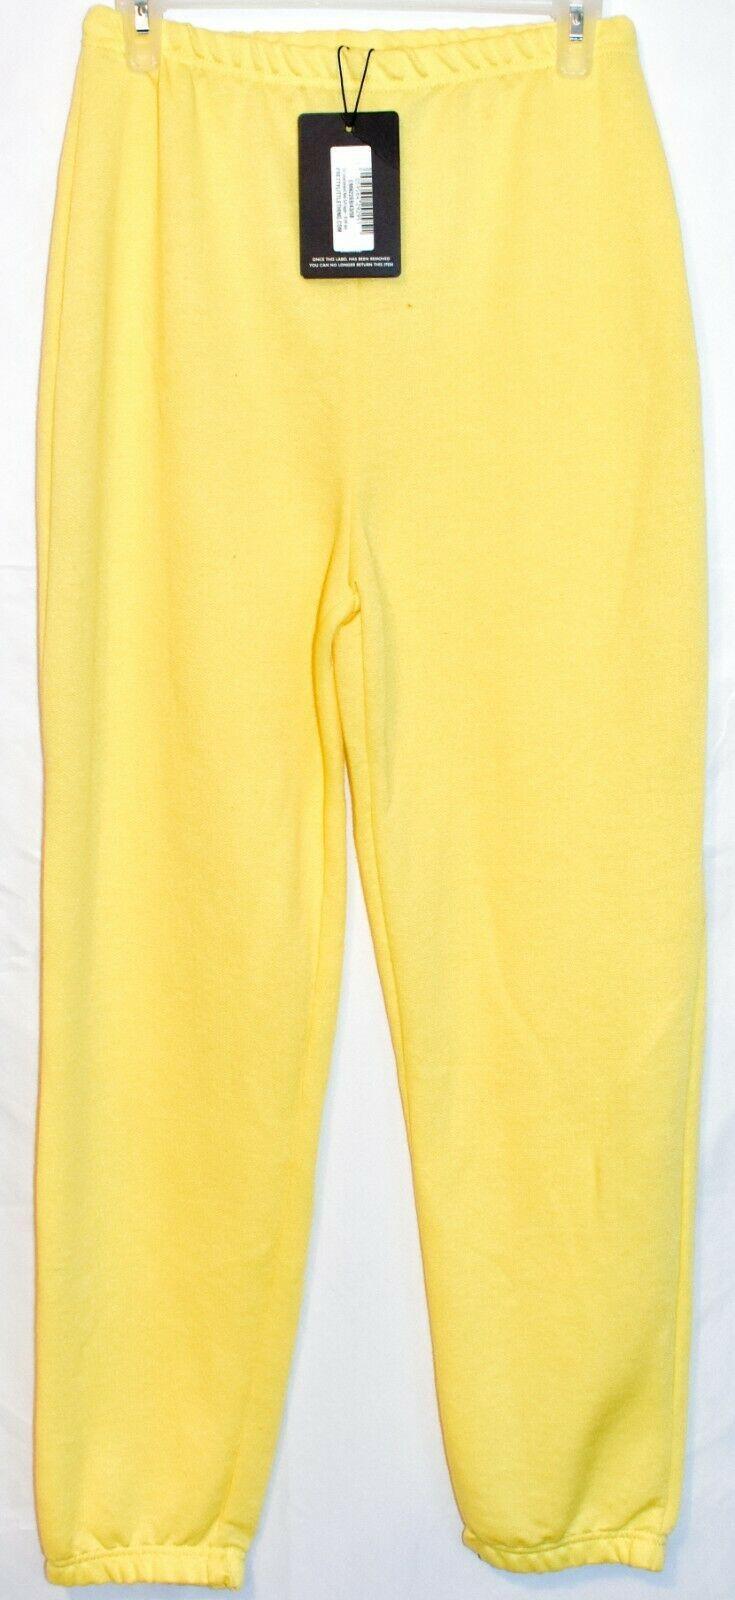 Pretty Little Thing Women's Yellow Oversized Basic Cuff Joggers Pants Size 6 NWT